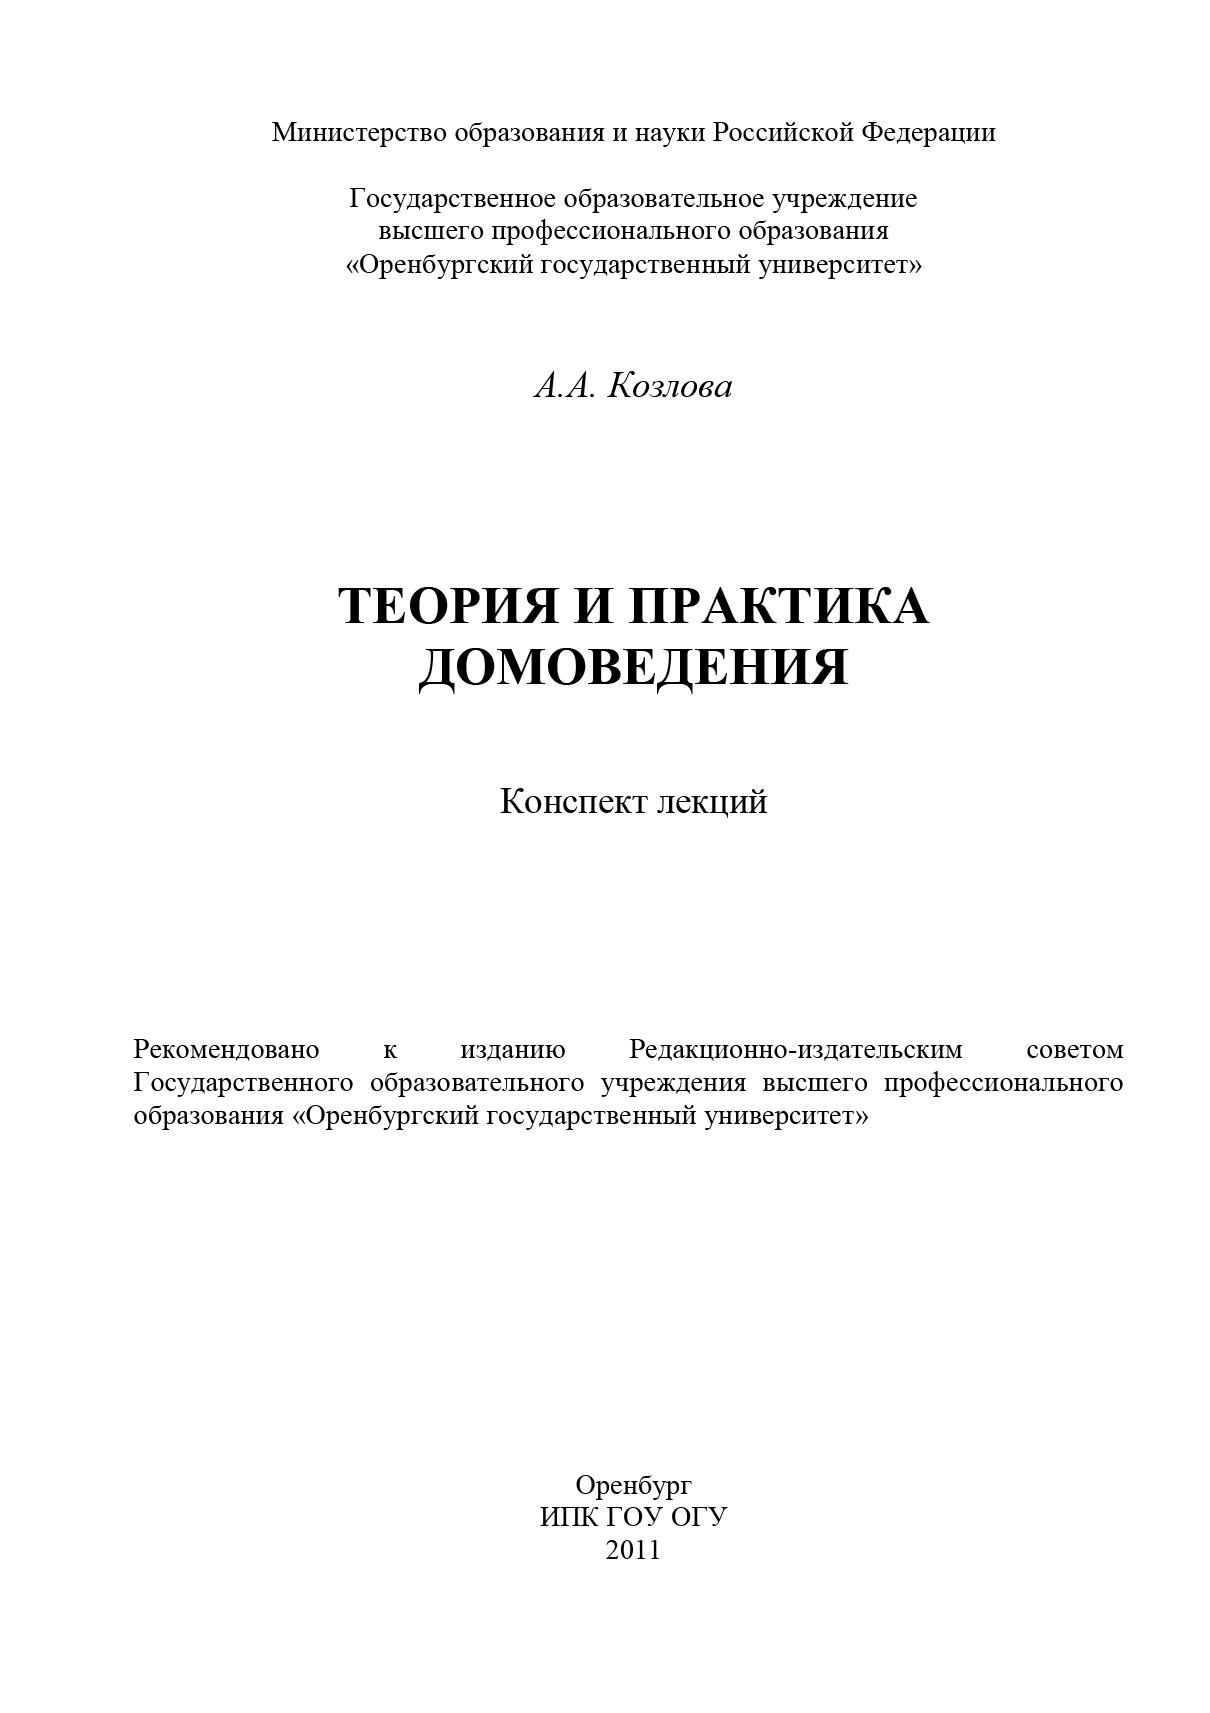 А. А. Козлова Теория и практика домоведения полосин а в политический регион опыт операционализации и концептуализации понятия